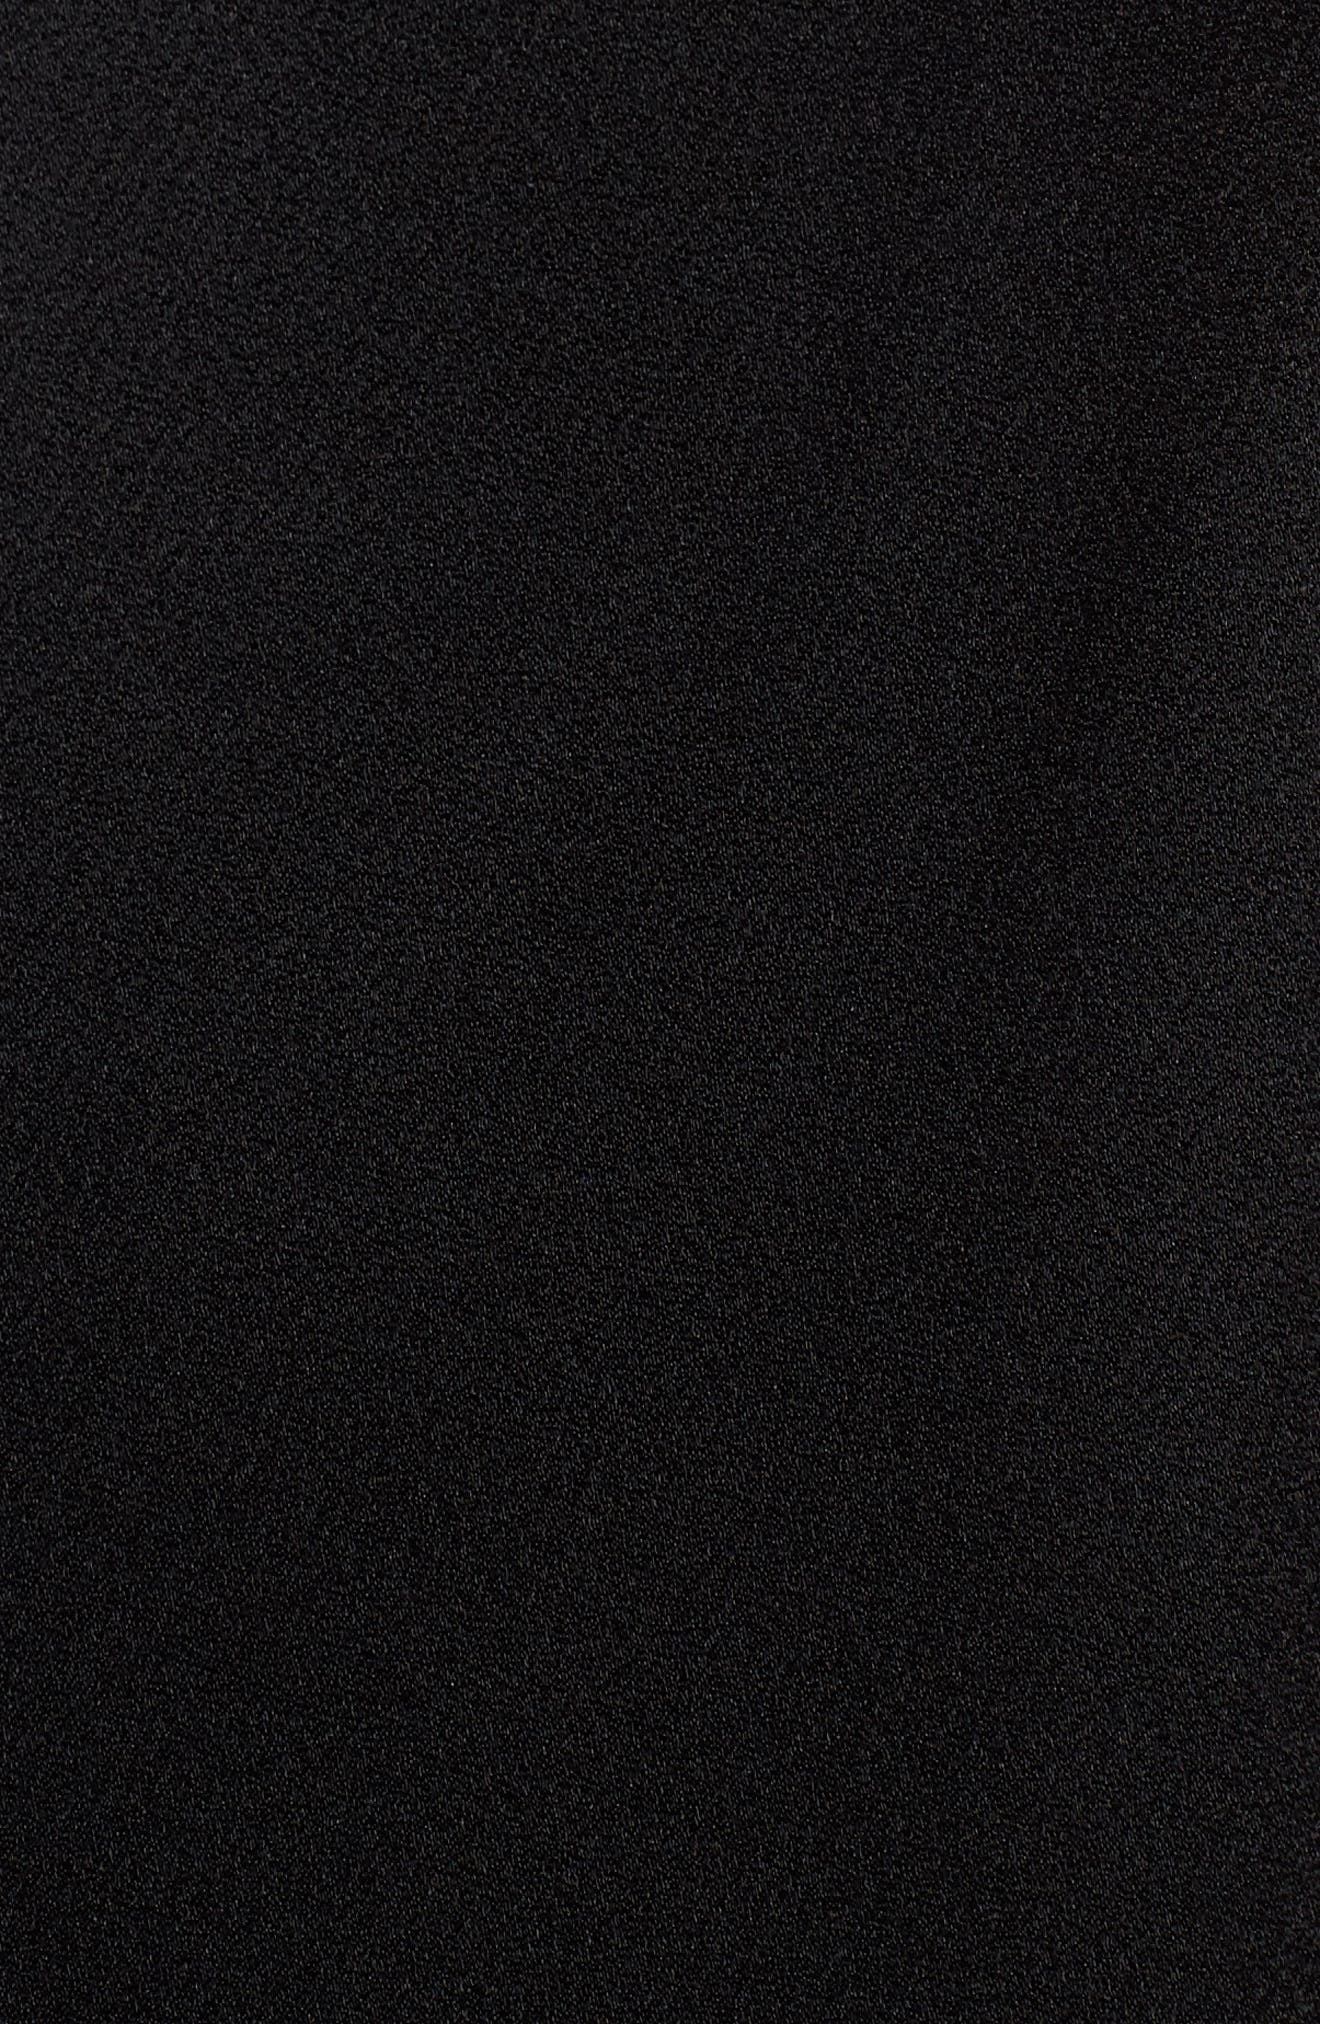 Daviana Sheath Dress,                             Alternate thumbnail 5, color,                             001